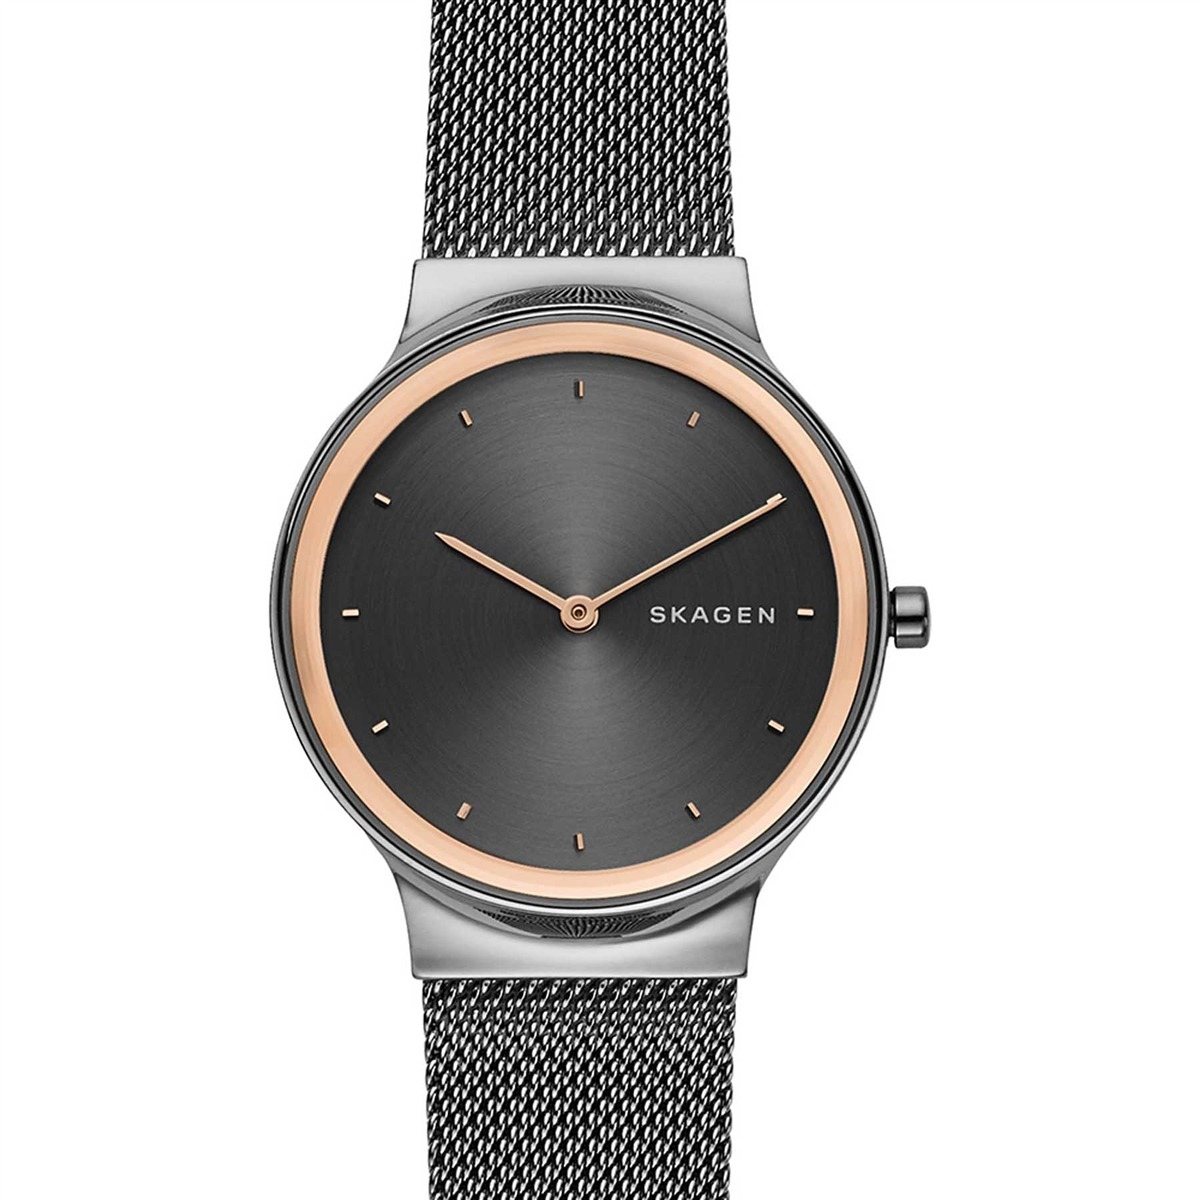 0f71d70ac9d71 Relógio Skagen Feminino Slim Analógico Skw2707 1cn - R  1.038,45 em ...